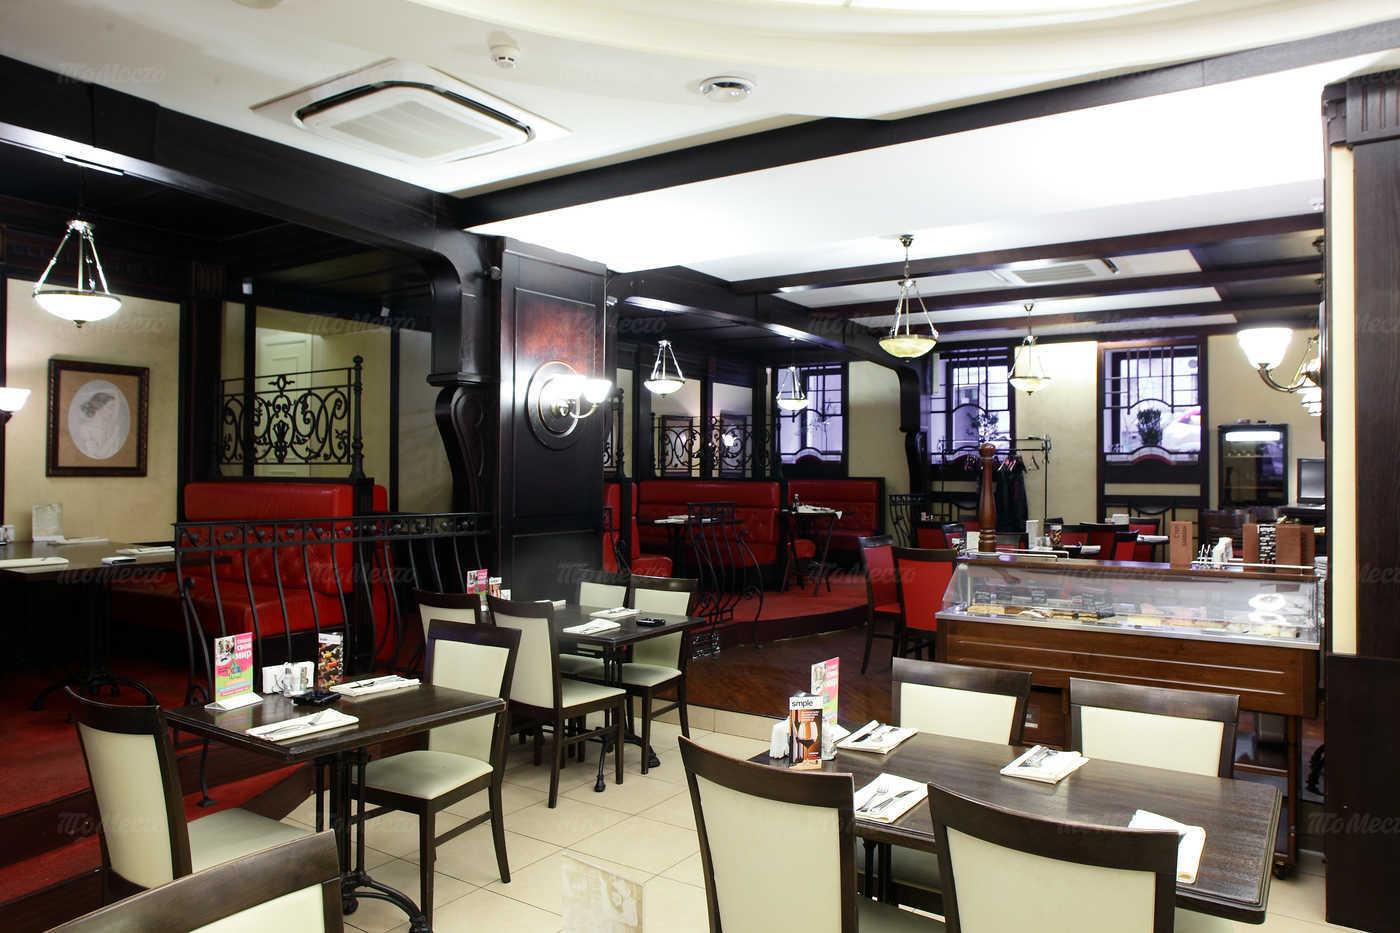 Ресторан Semplice (Траттория Семпличе) на улице Чаплыгина фото 3